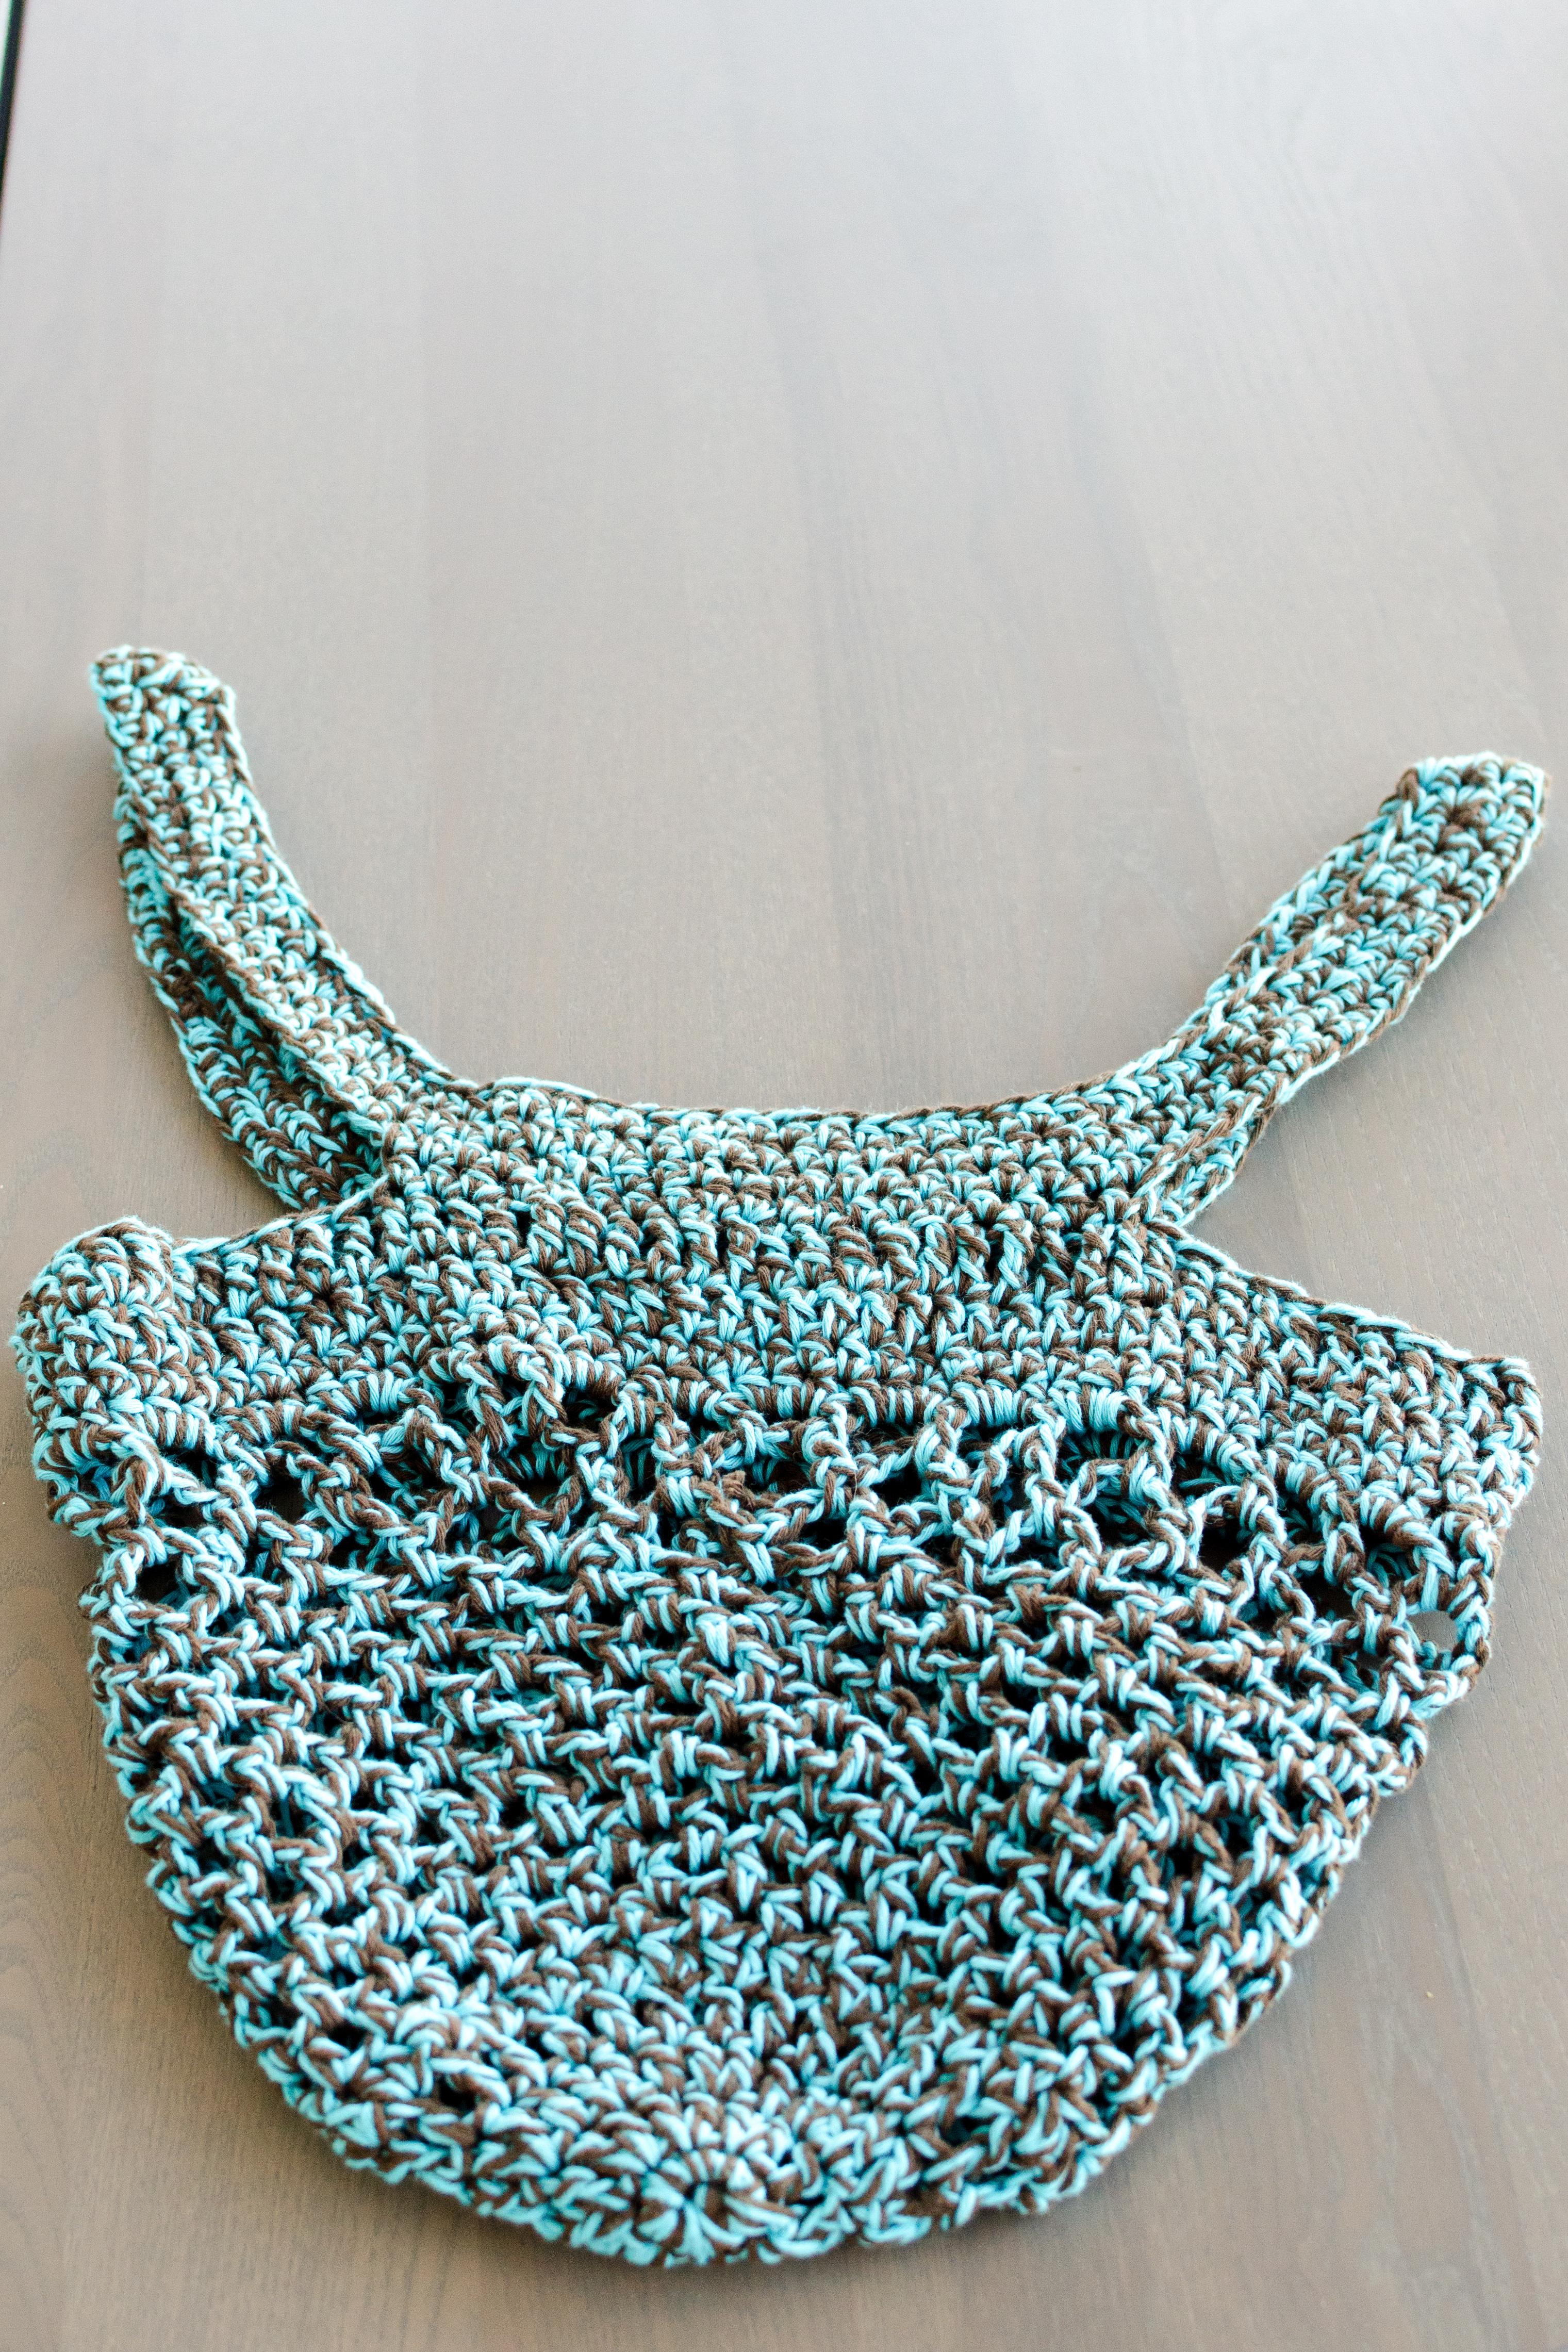 Annie's market bag